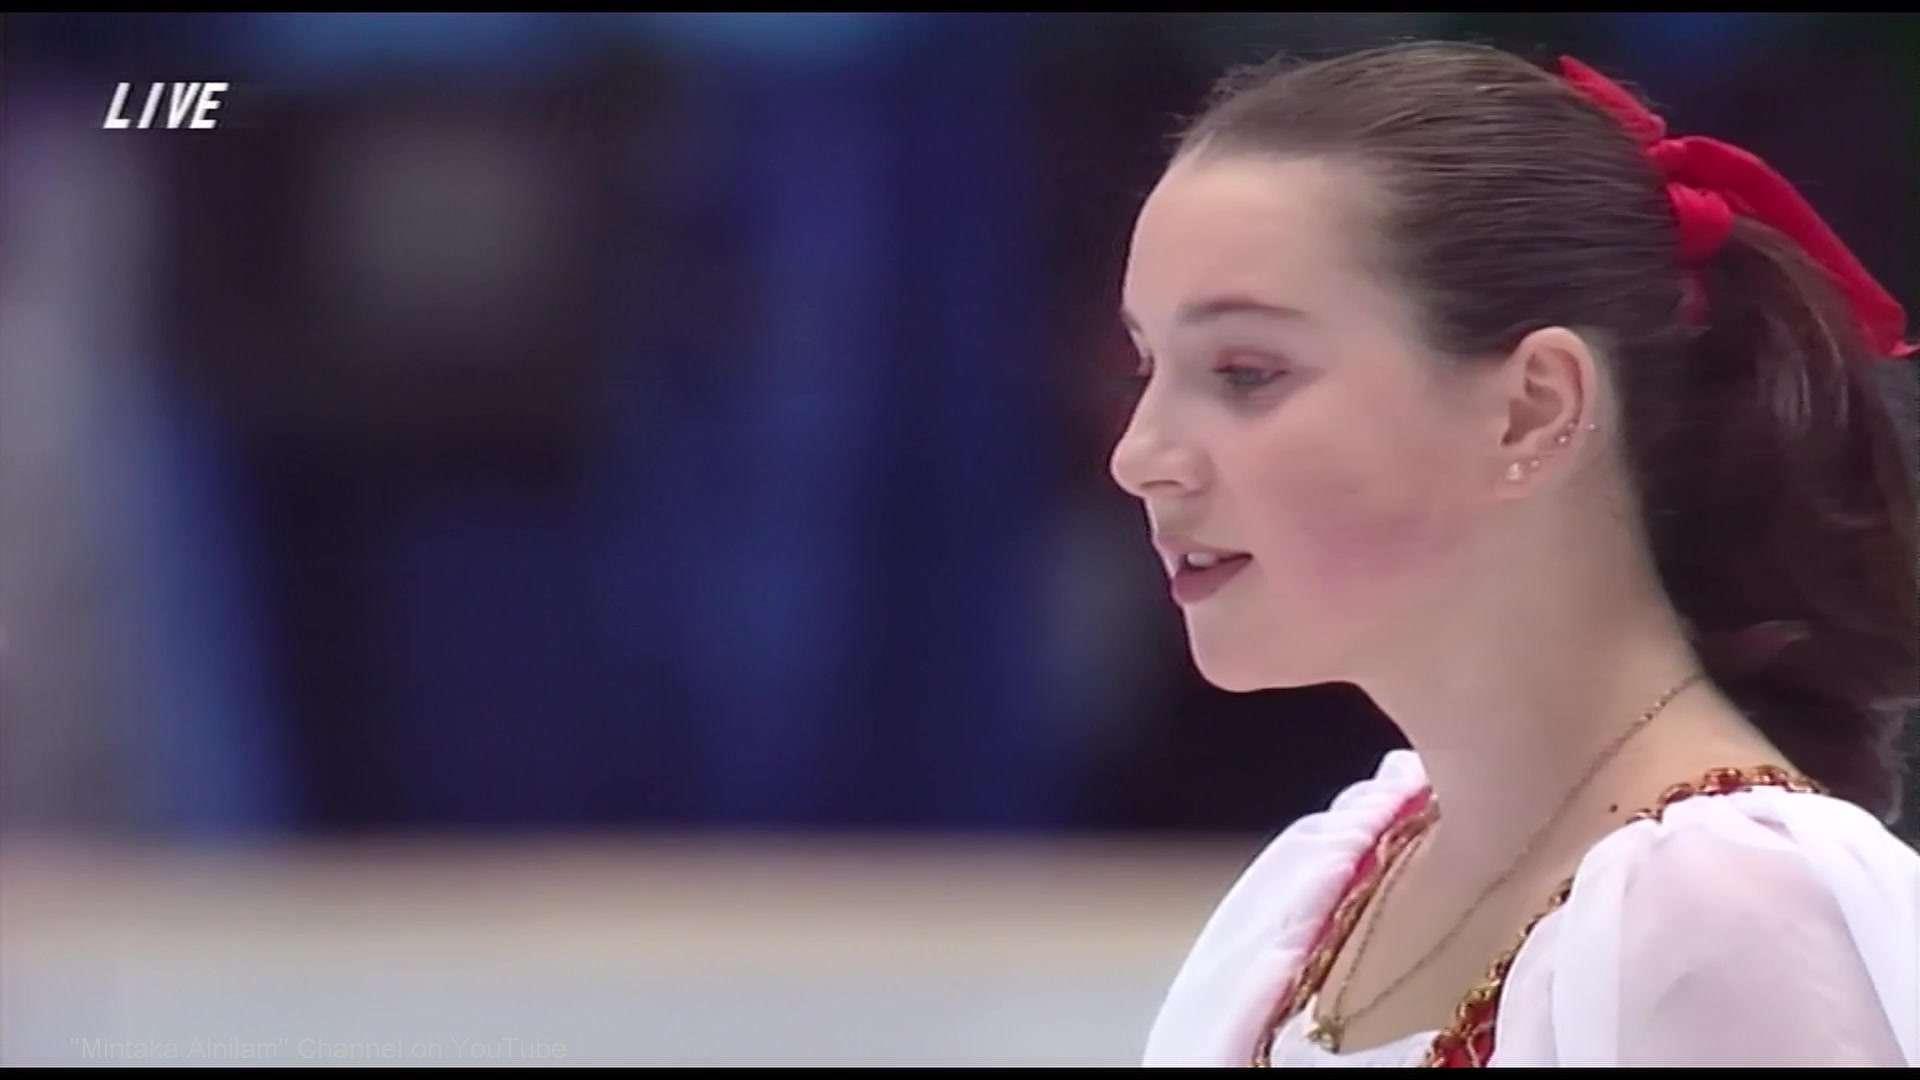 [HD] Irina Slutskaya - 1998 Nagano Olympics - FS イリーナ・スルツカヤ Ирина Слуцкая - YouTube